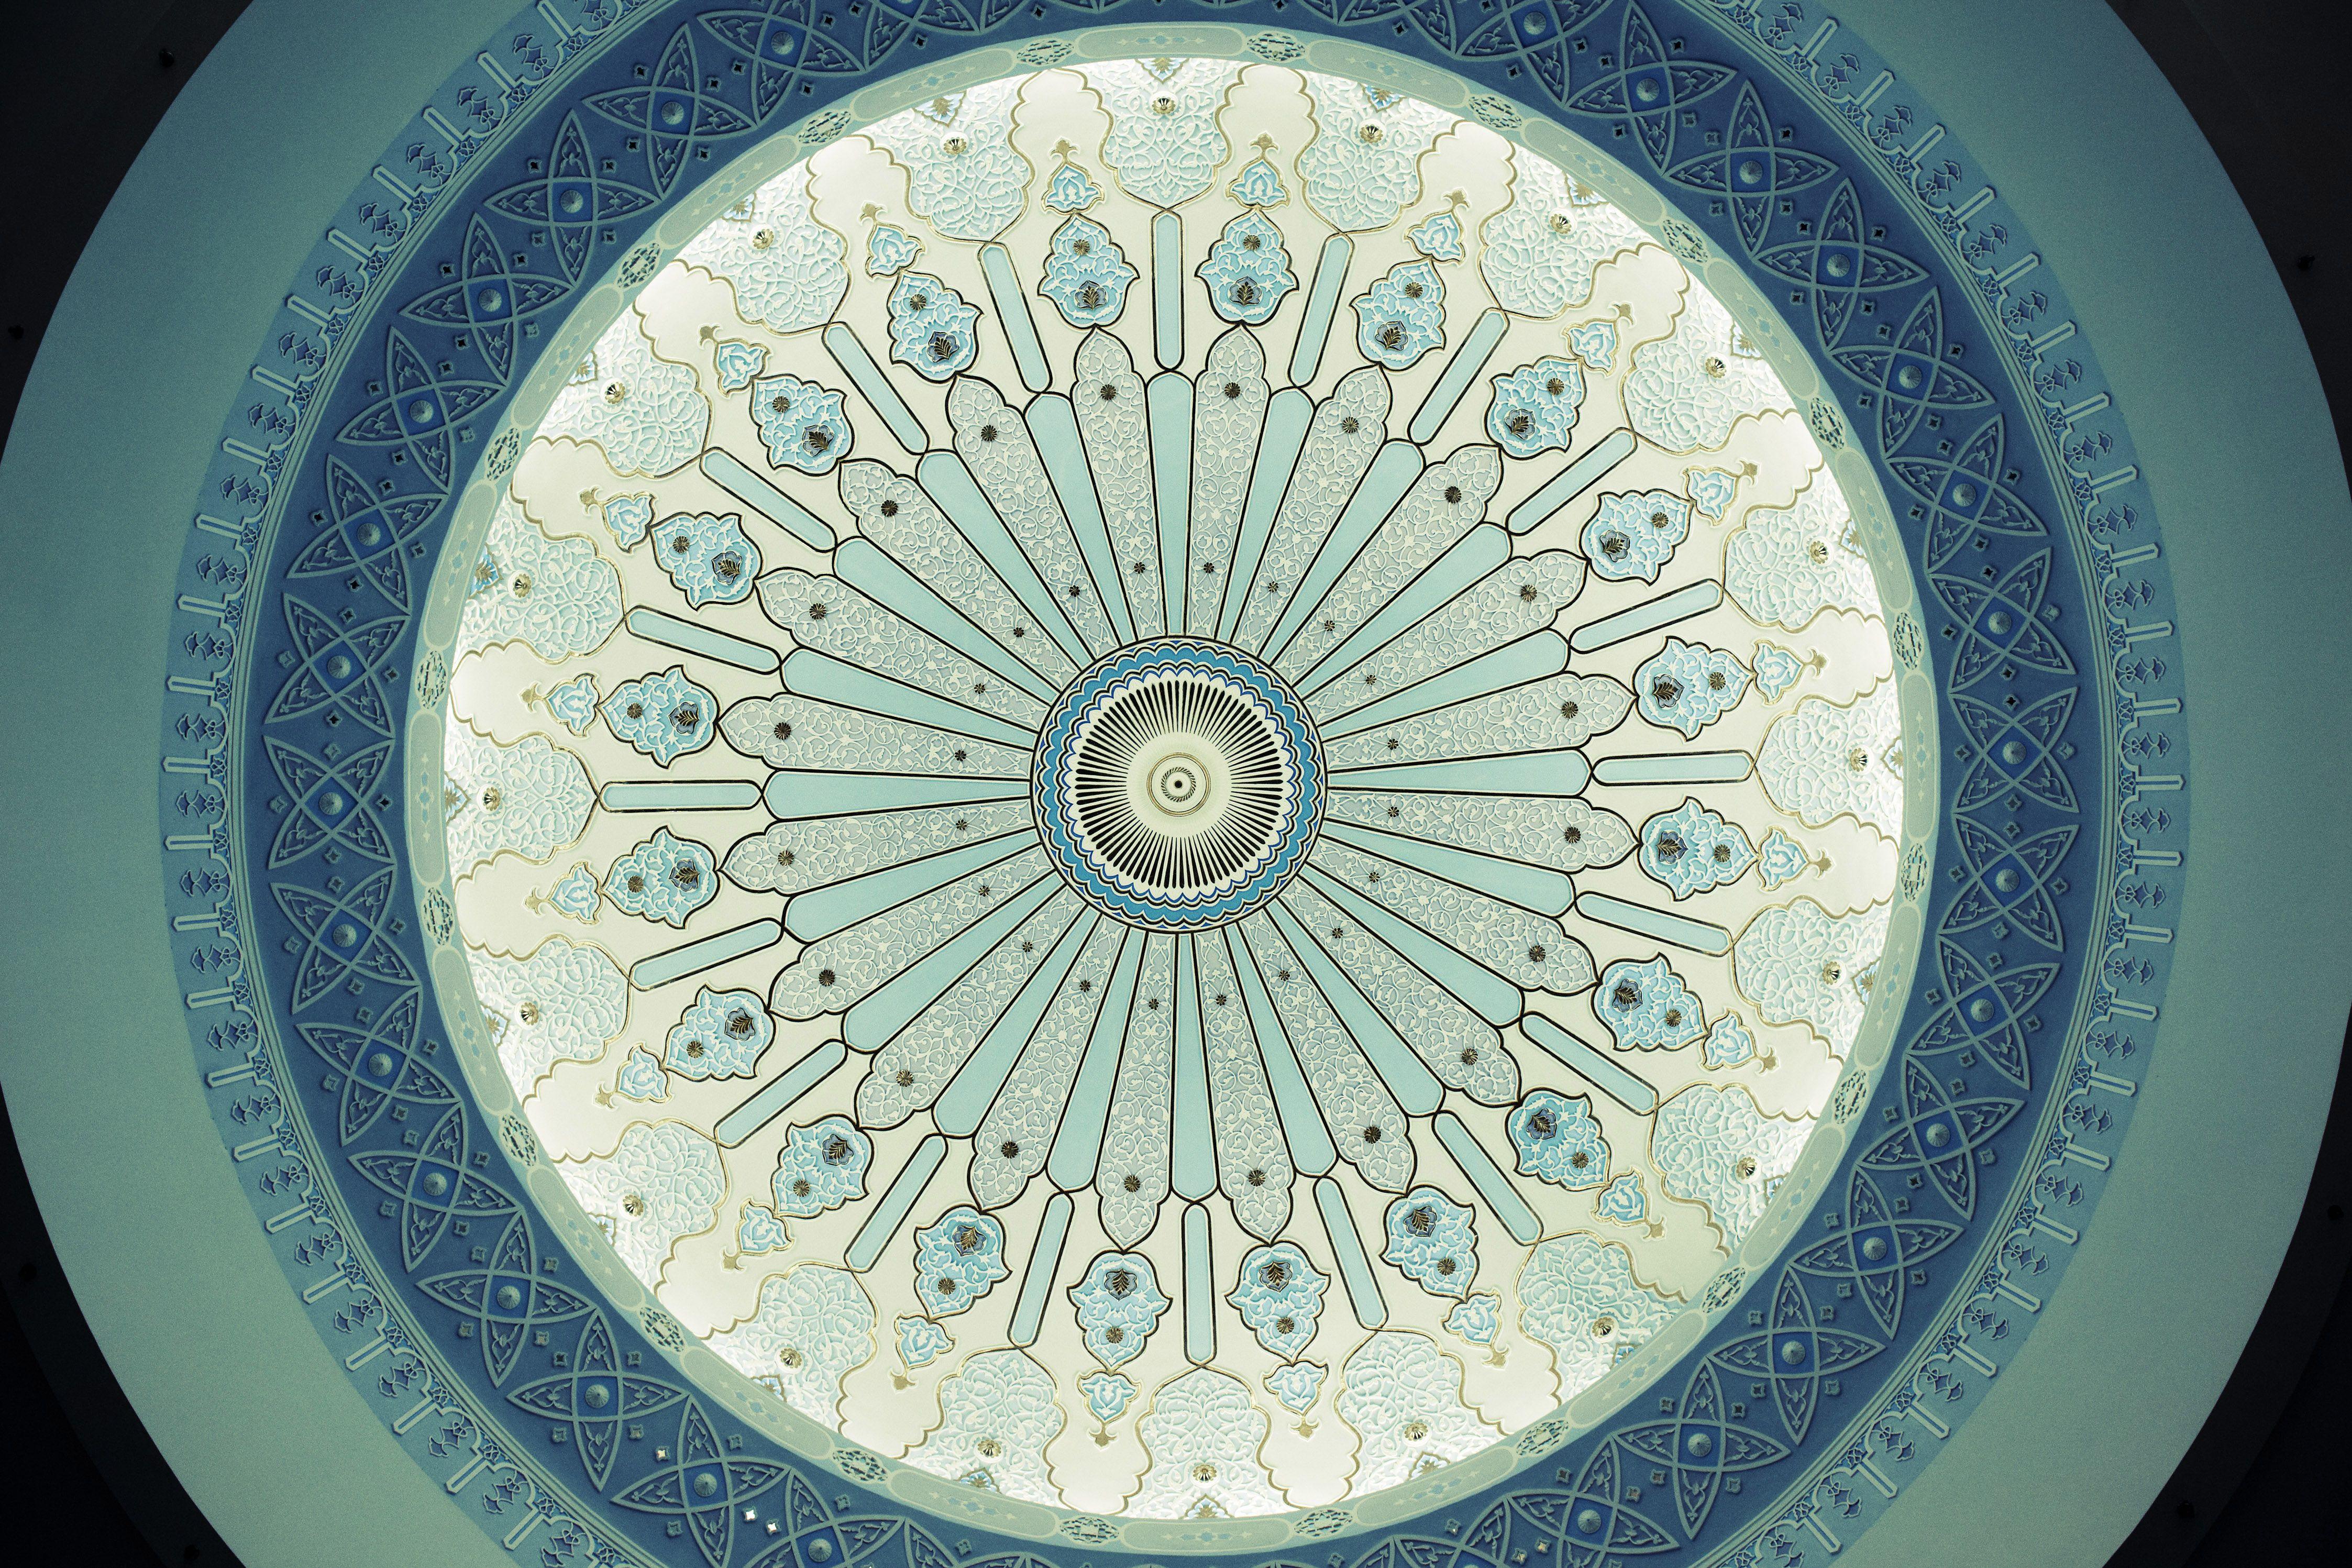 Dome of the Islamic Arts Museum, Kuala Lumpur